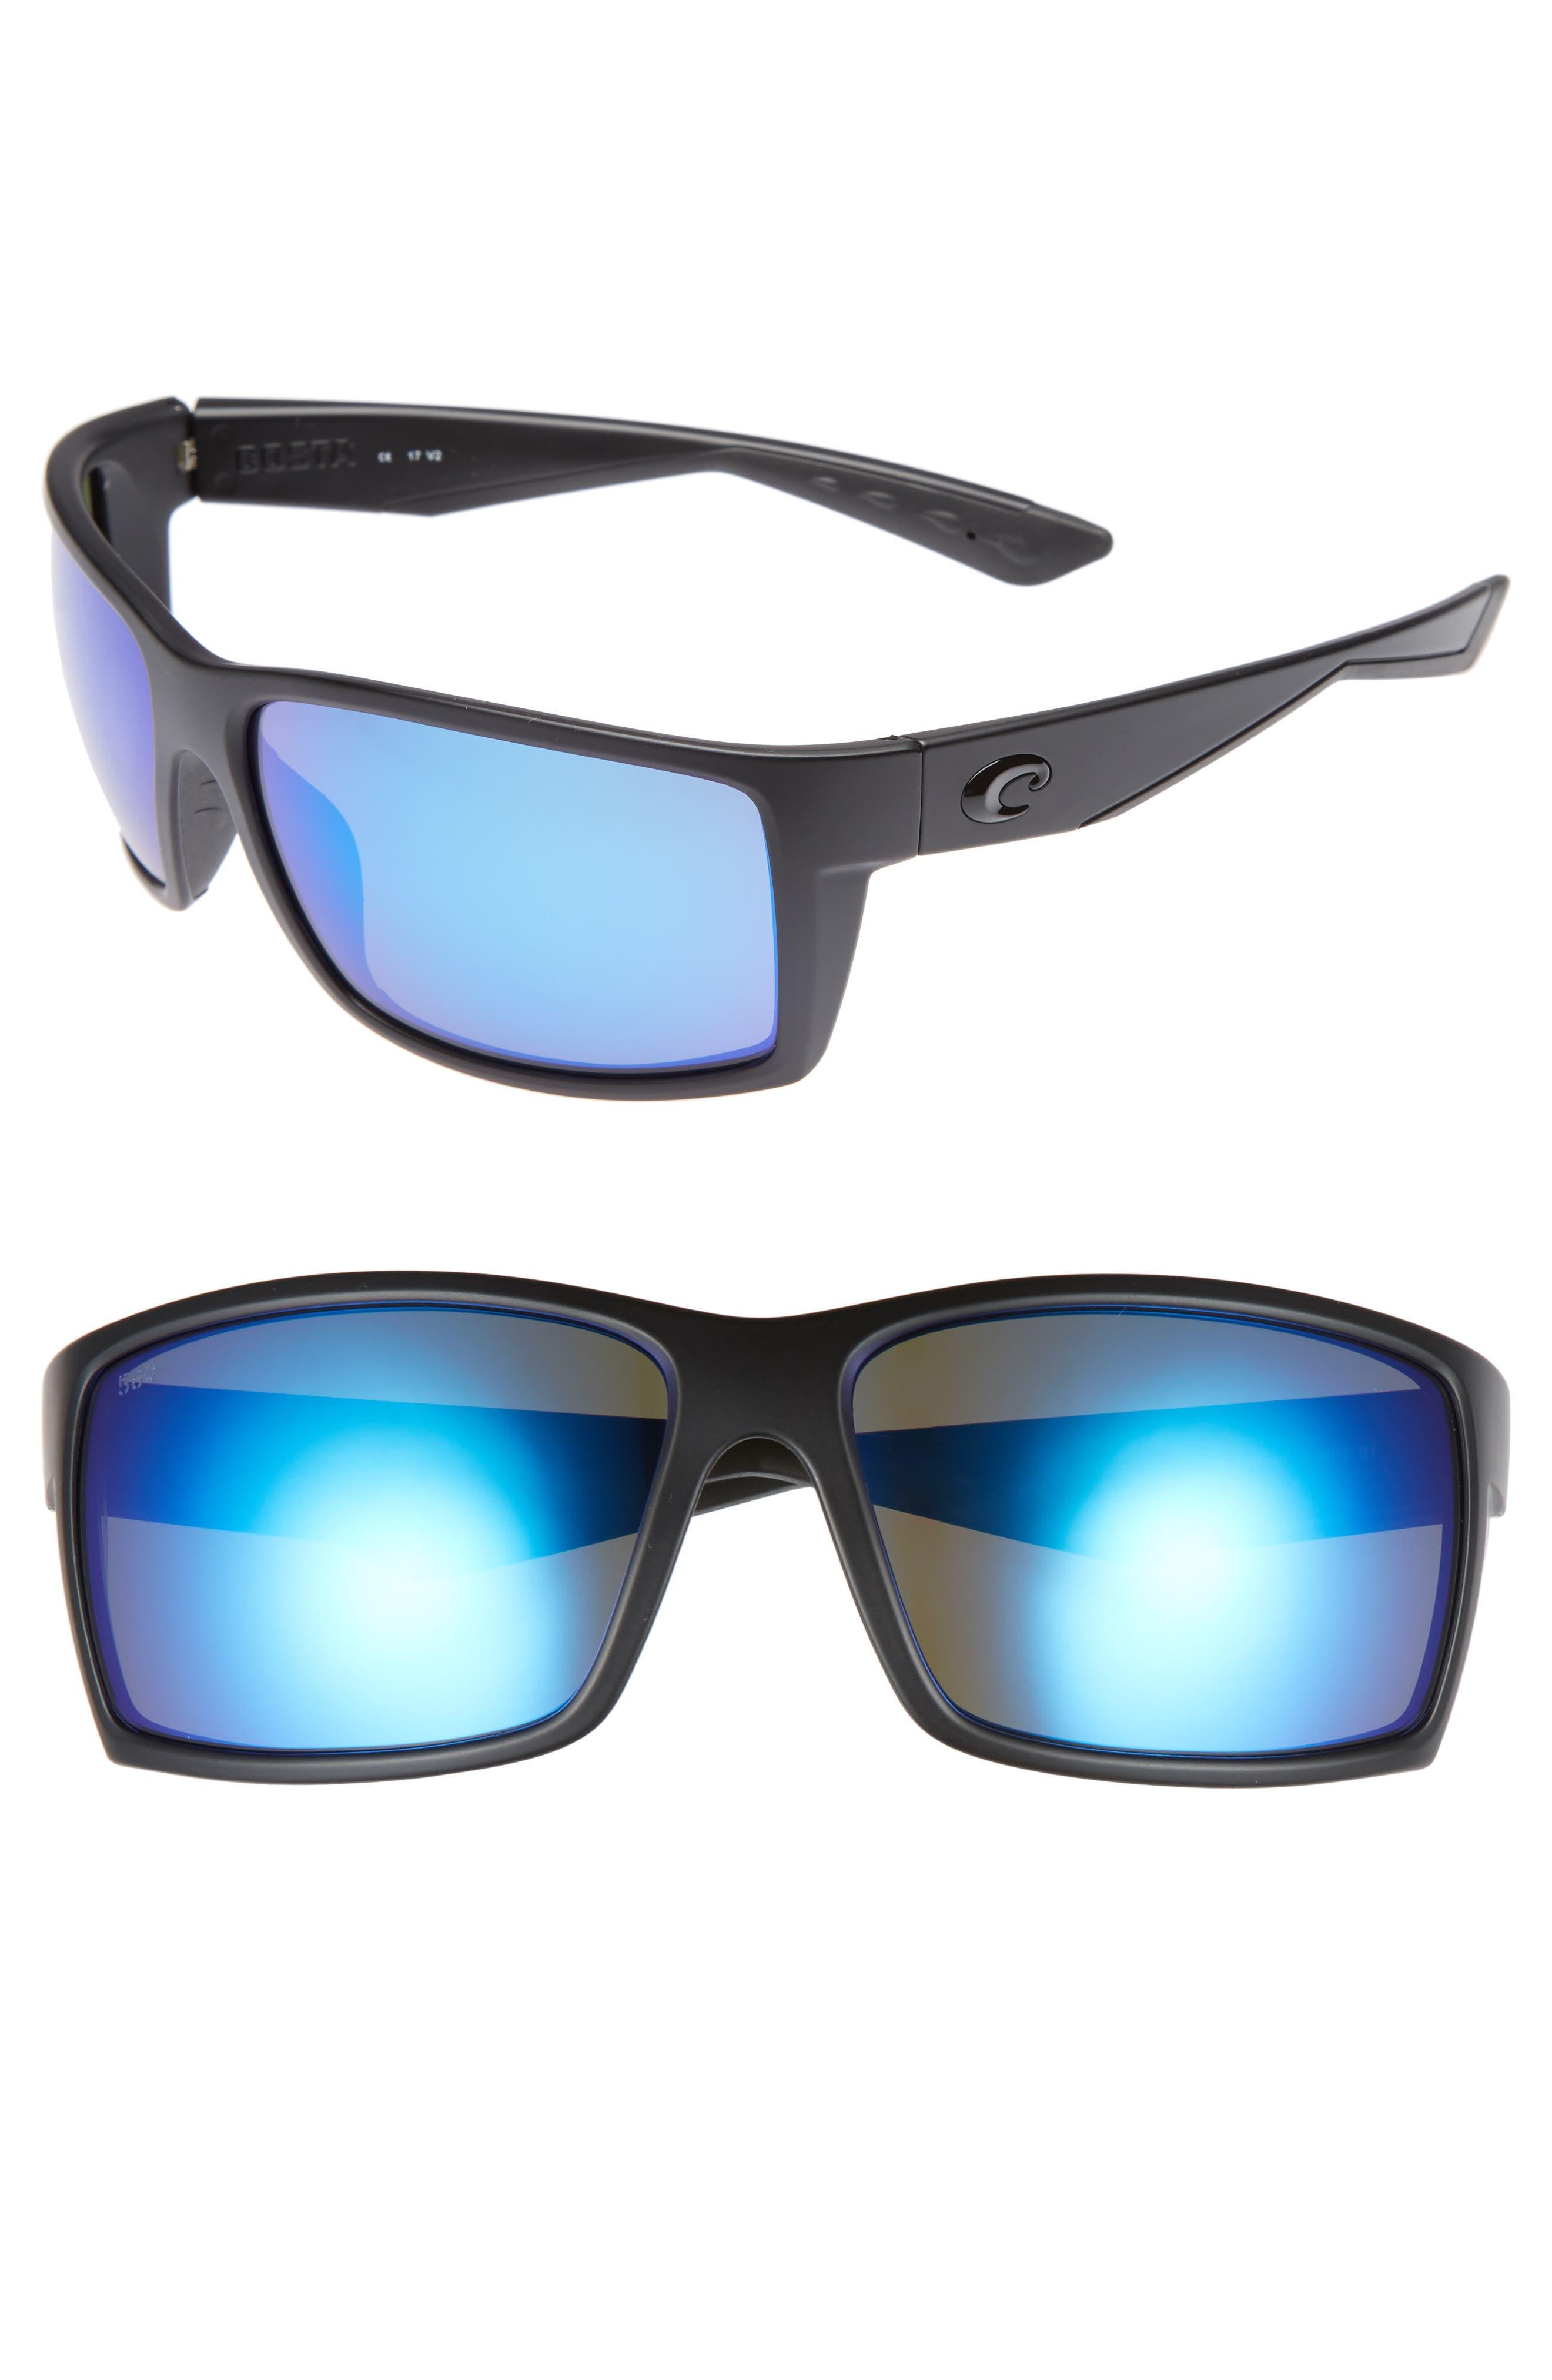 Reefton 65mm Polarized Sunglasses,                         Main,                         color, Blackout/ Blue Mirror